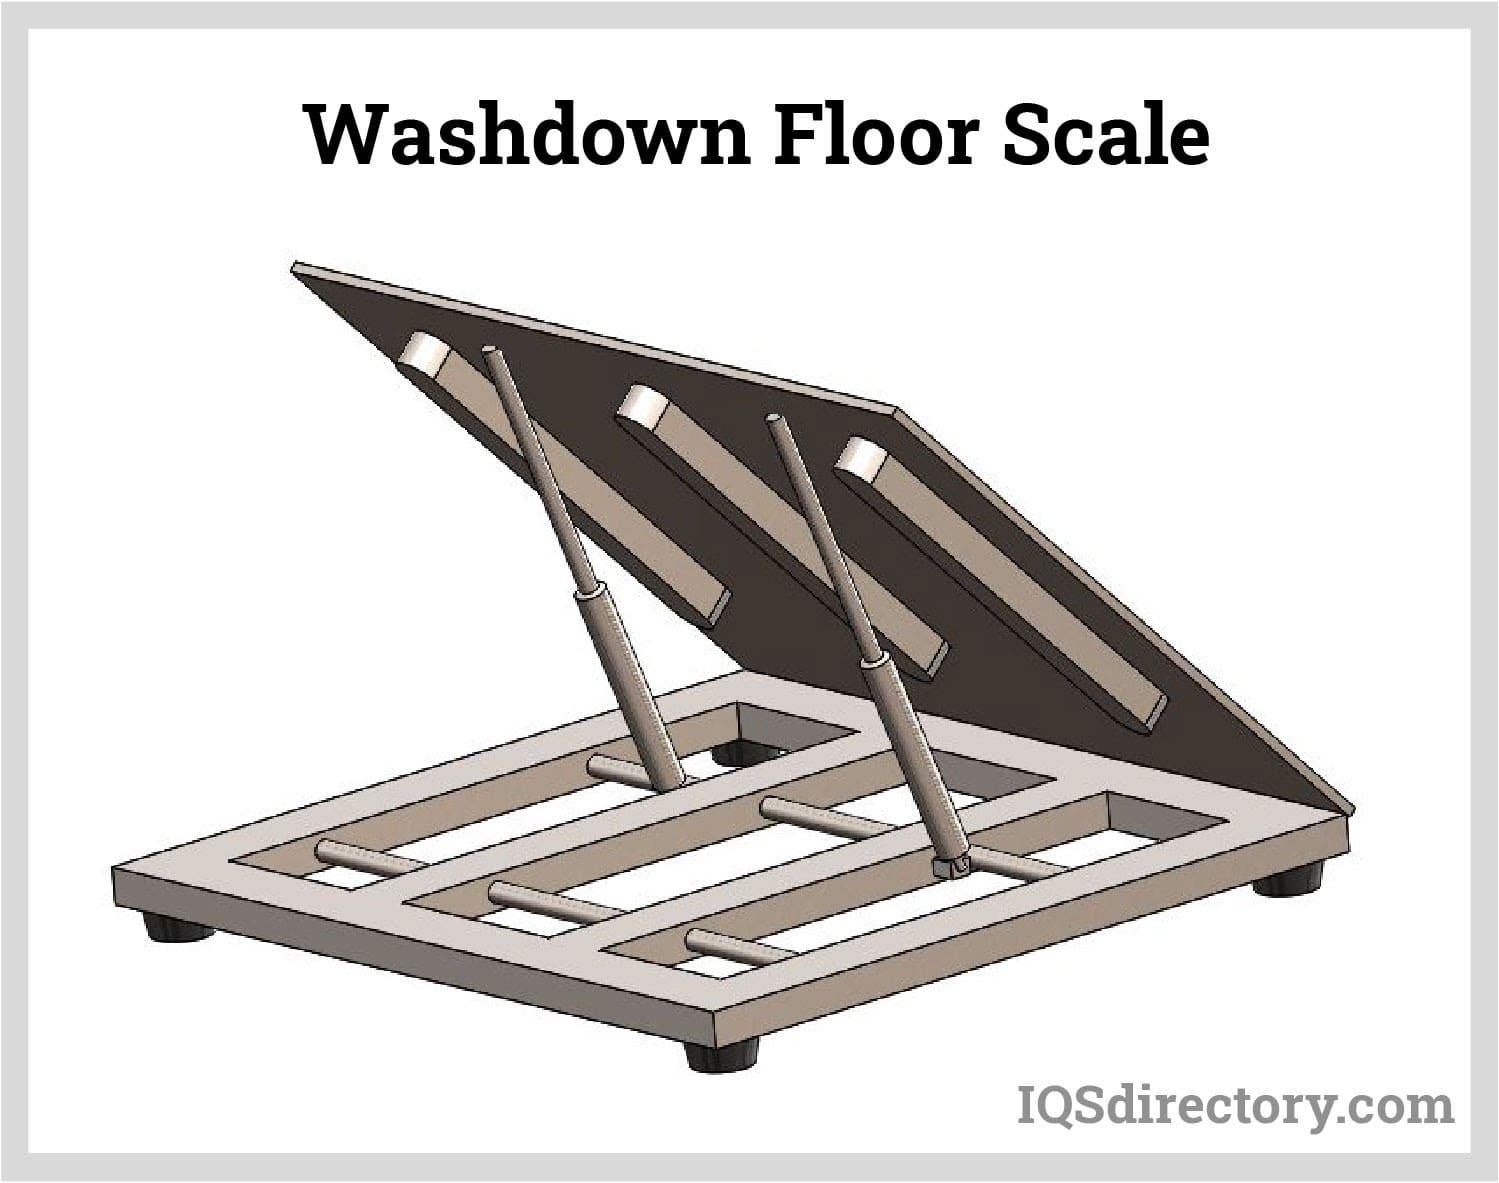 Washdown Floor Scale